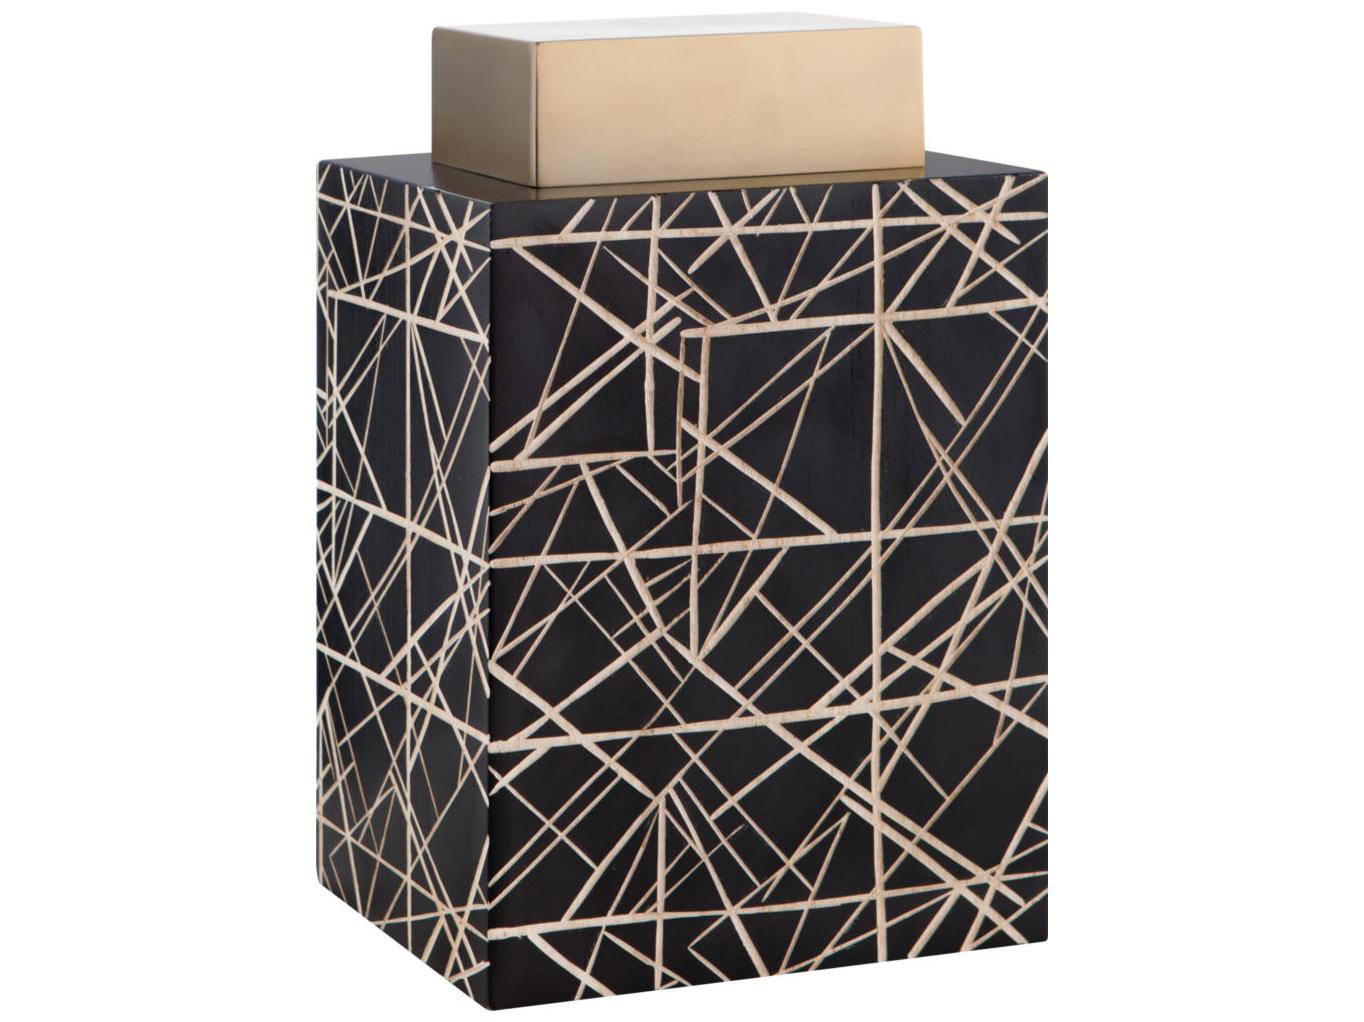 Декоративная ваза M-Style 5290090 от thefurnish